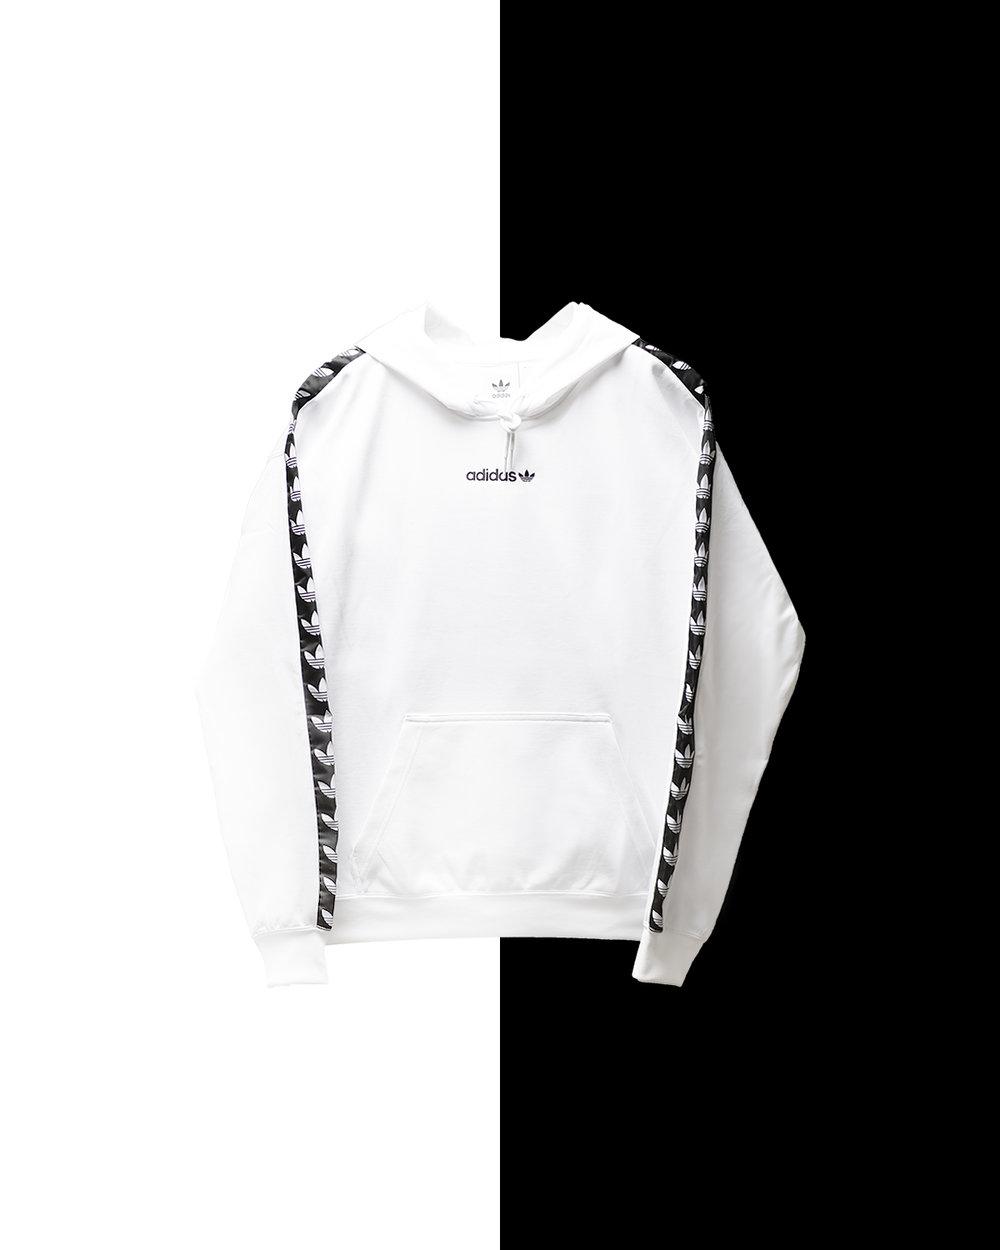 Adidas-white-hoodie.jpg